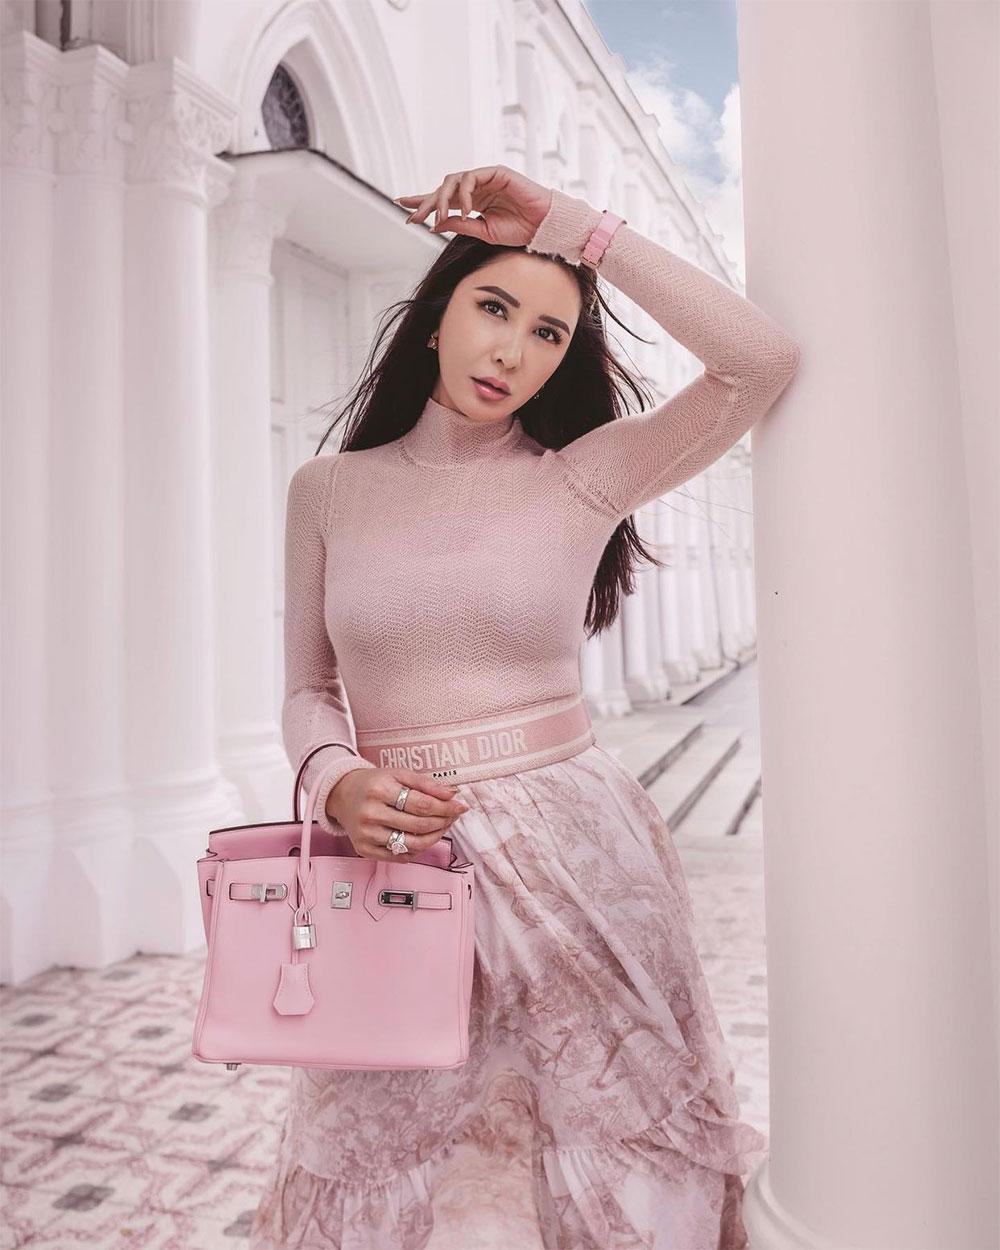 Jamie Chua, Hermès Singapore handbag queen, with a 25cm Bir Birkin model